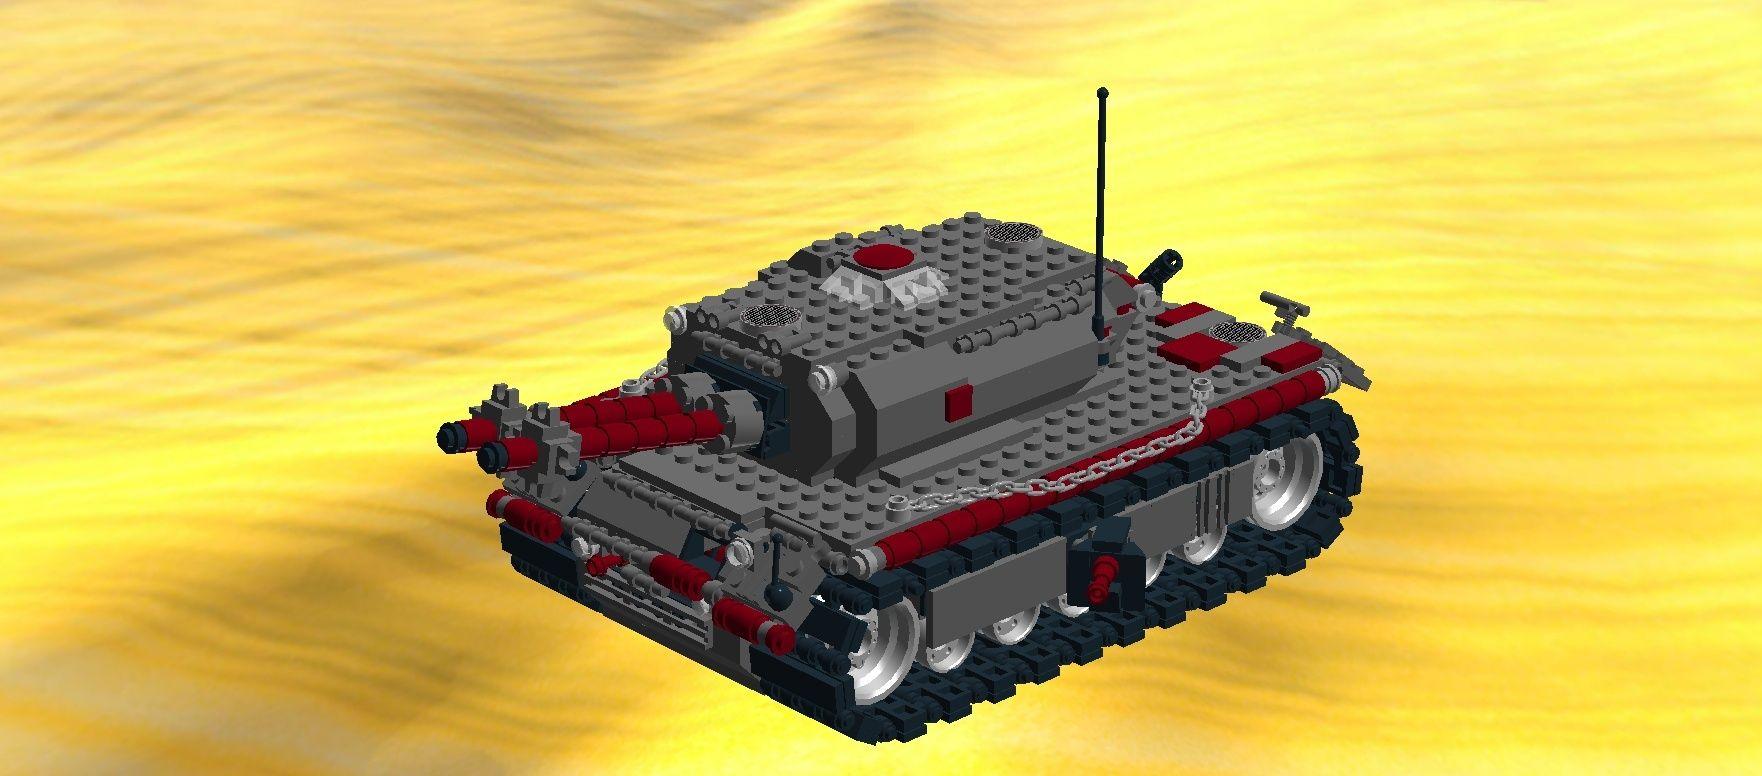 Tanks Database Enforc10